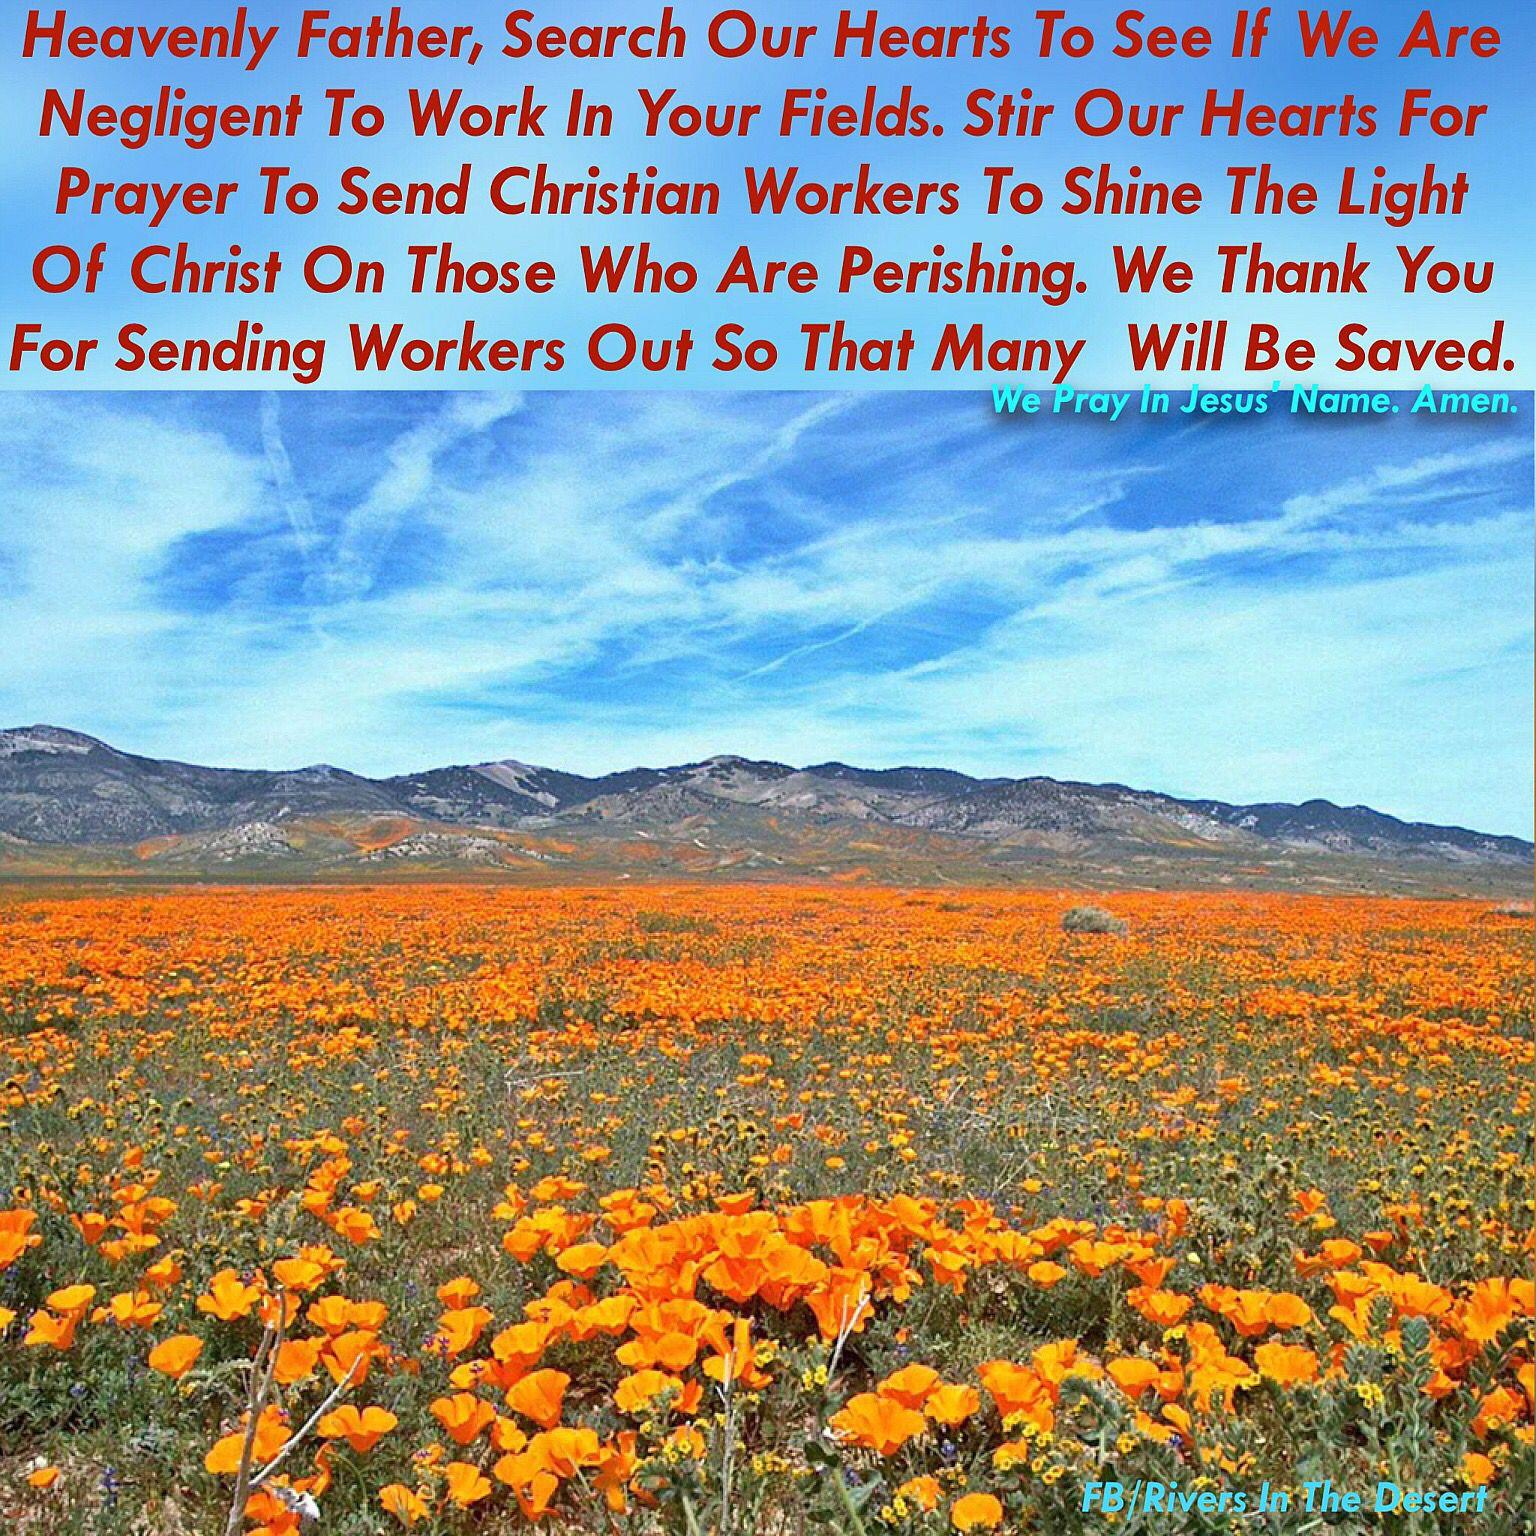 Prayer inspired by with Matthew 9:37,38